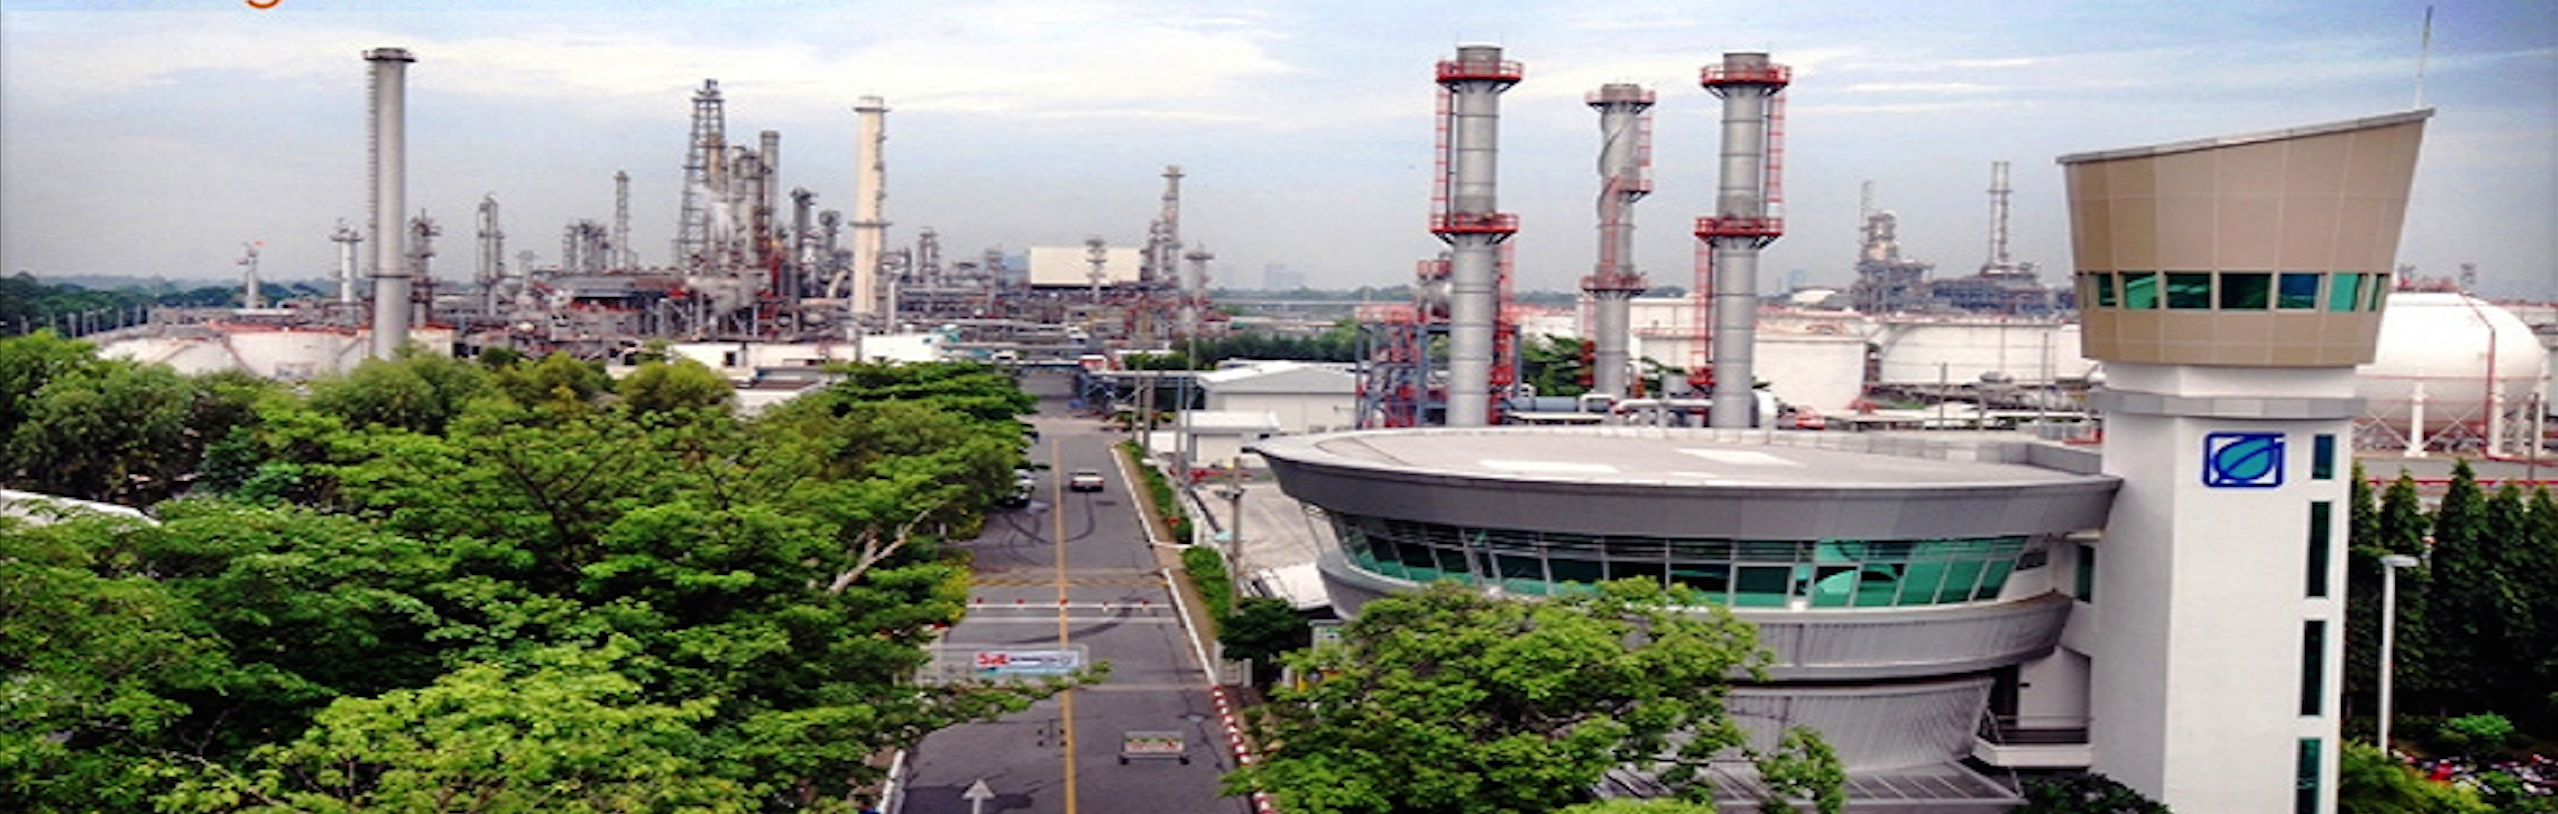 Combo Nhớt xe tay ga BCP Thái Lan nhập khẩu – SUPER 1 – 10W30 SL – 0.8 Lít + Nhớt Thái Lan nhập khẩu cho xe số BCP SUPER 1 - SAE 15W40 - API SL - JASO MA - 0.8L